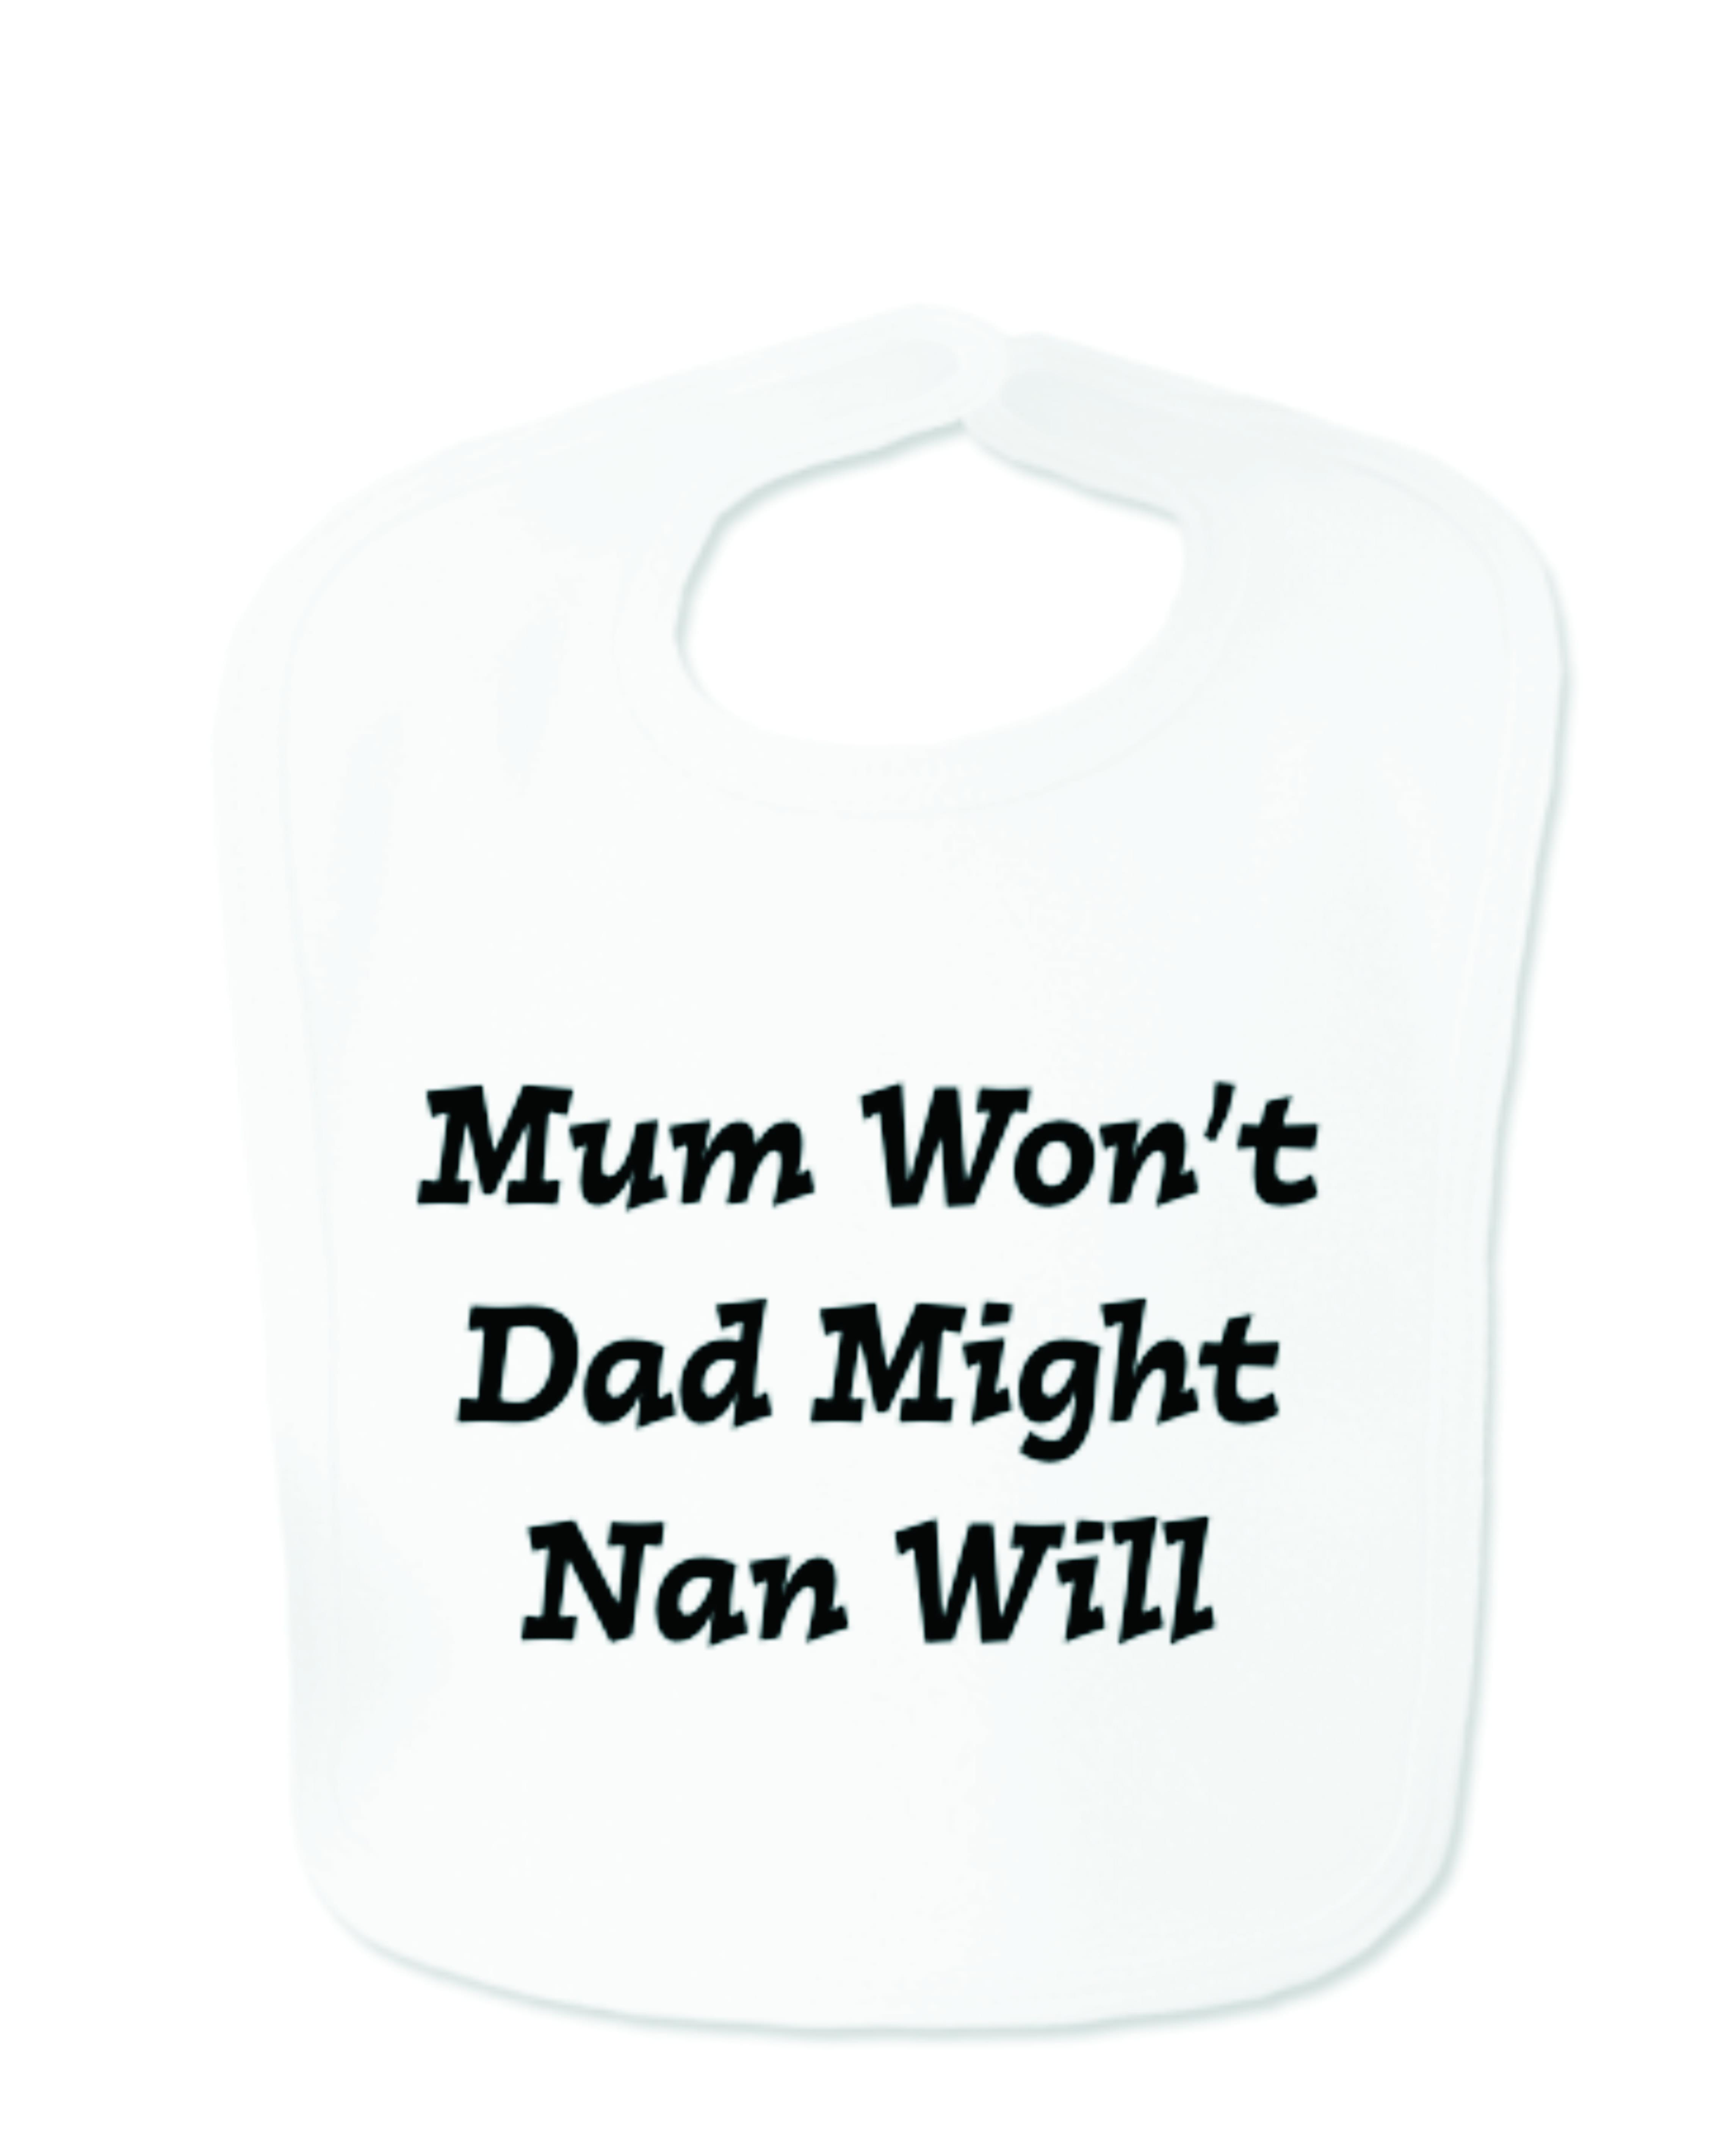 White Mum Won't Dad Might Nan Will Velcro Baby Bib